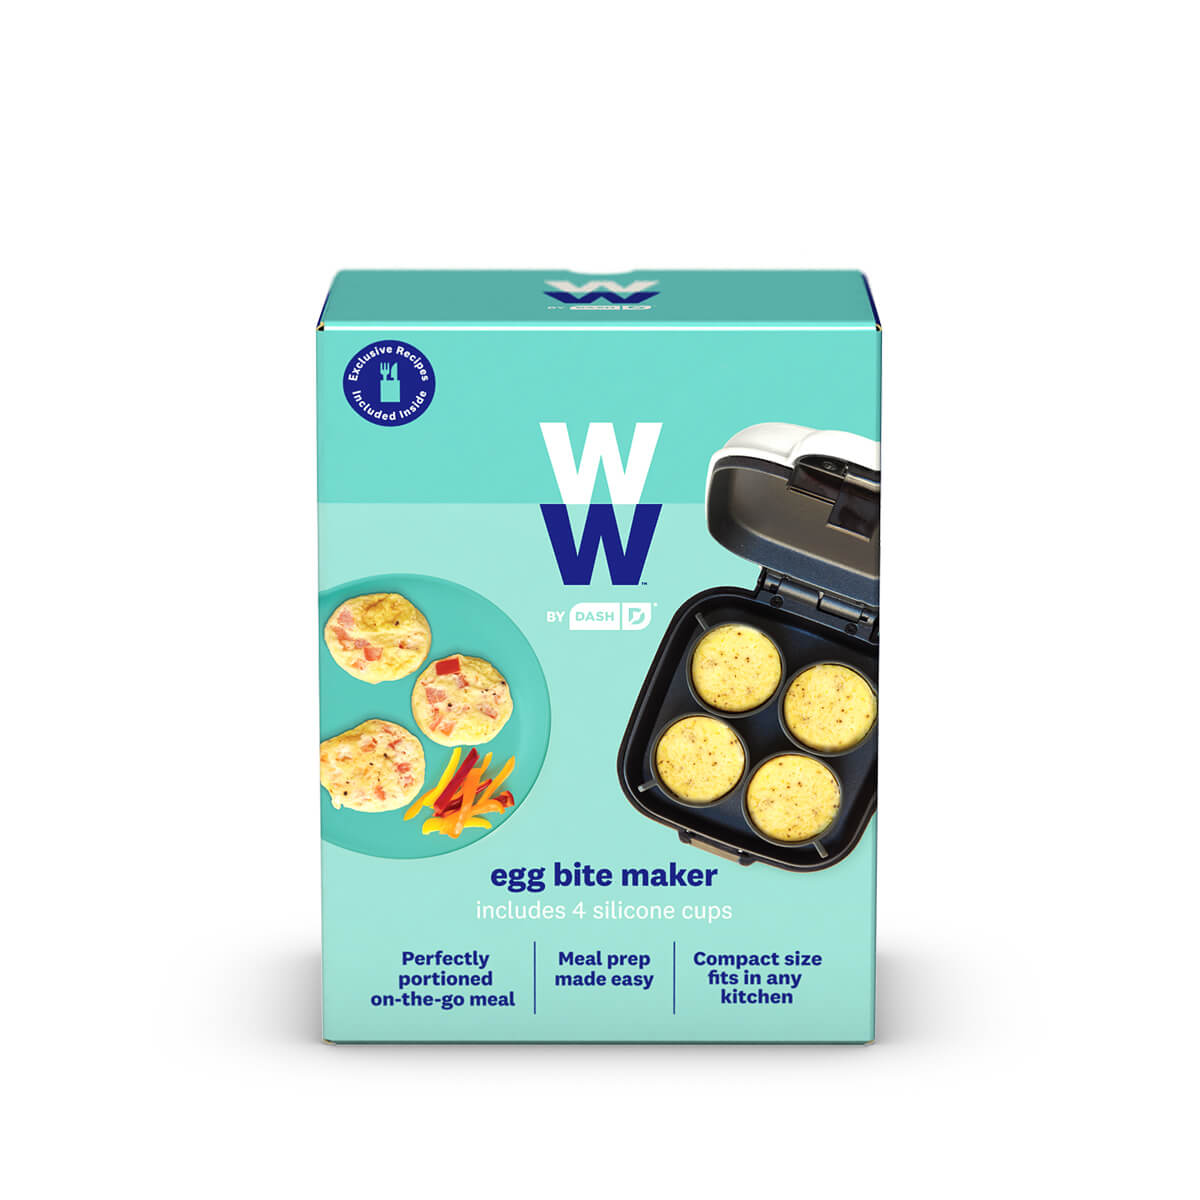 WW by Dash Egg Bite Maker - front